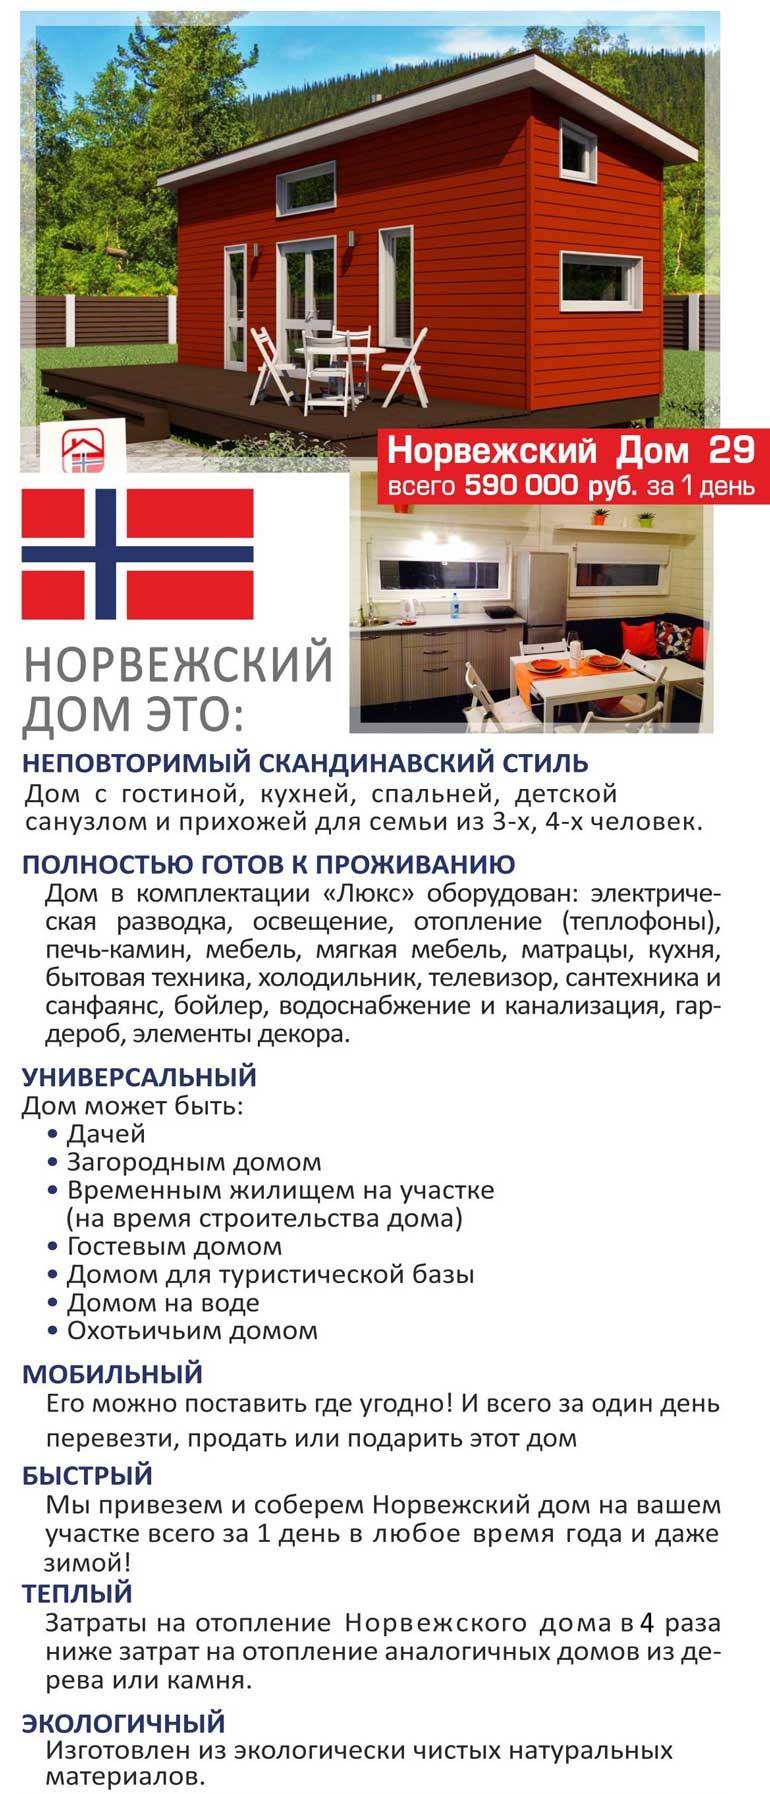 norvezhskiy-dom-29-modum-za-1-den